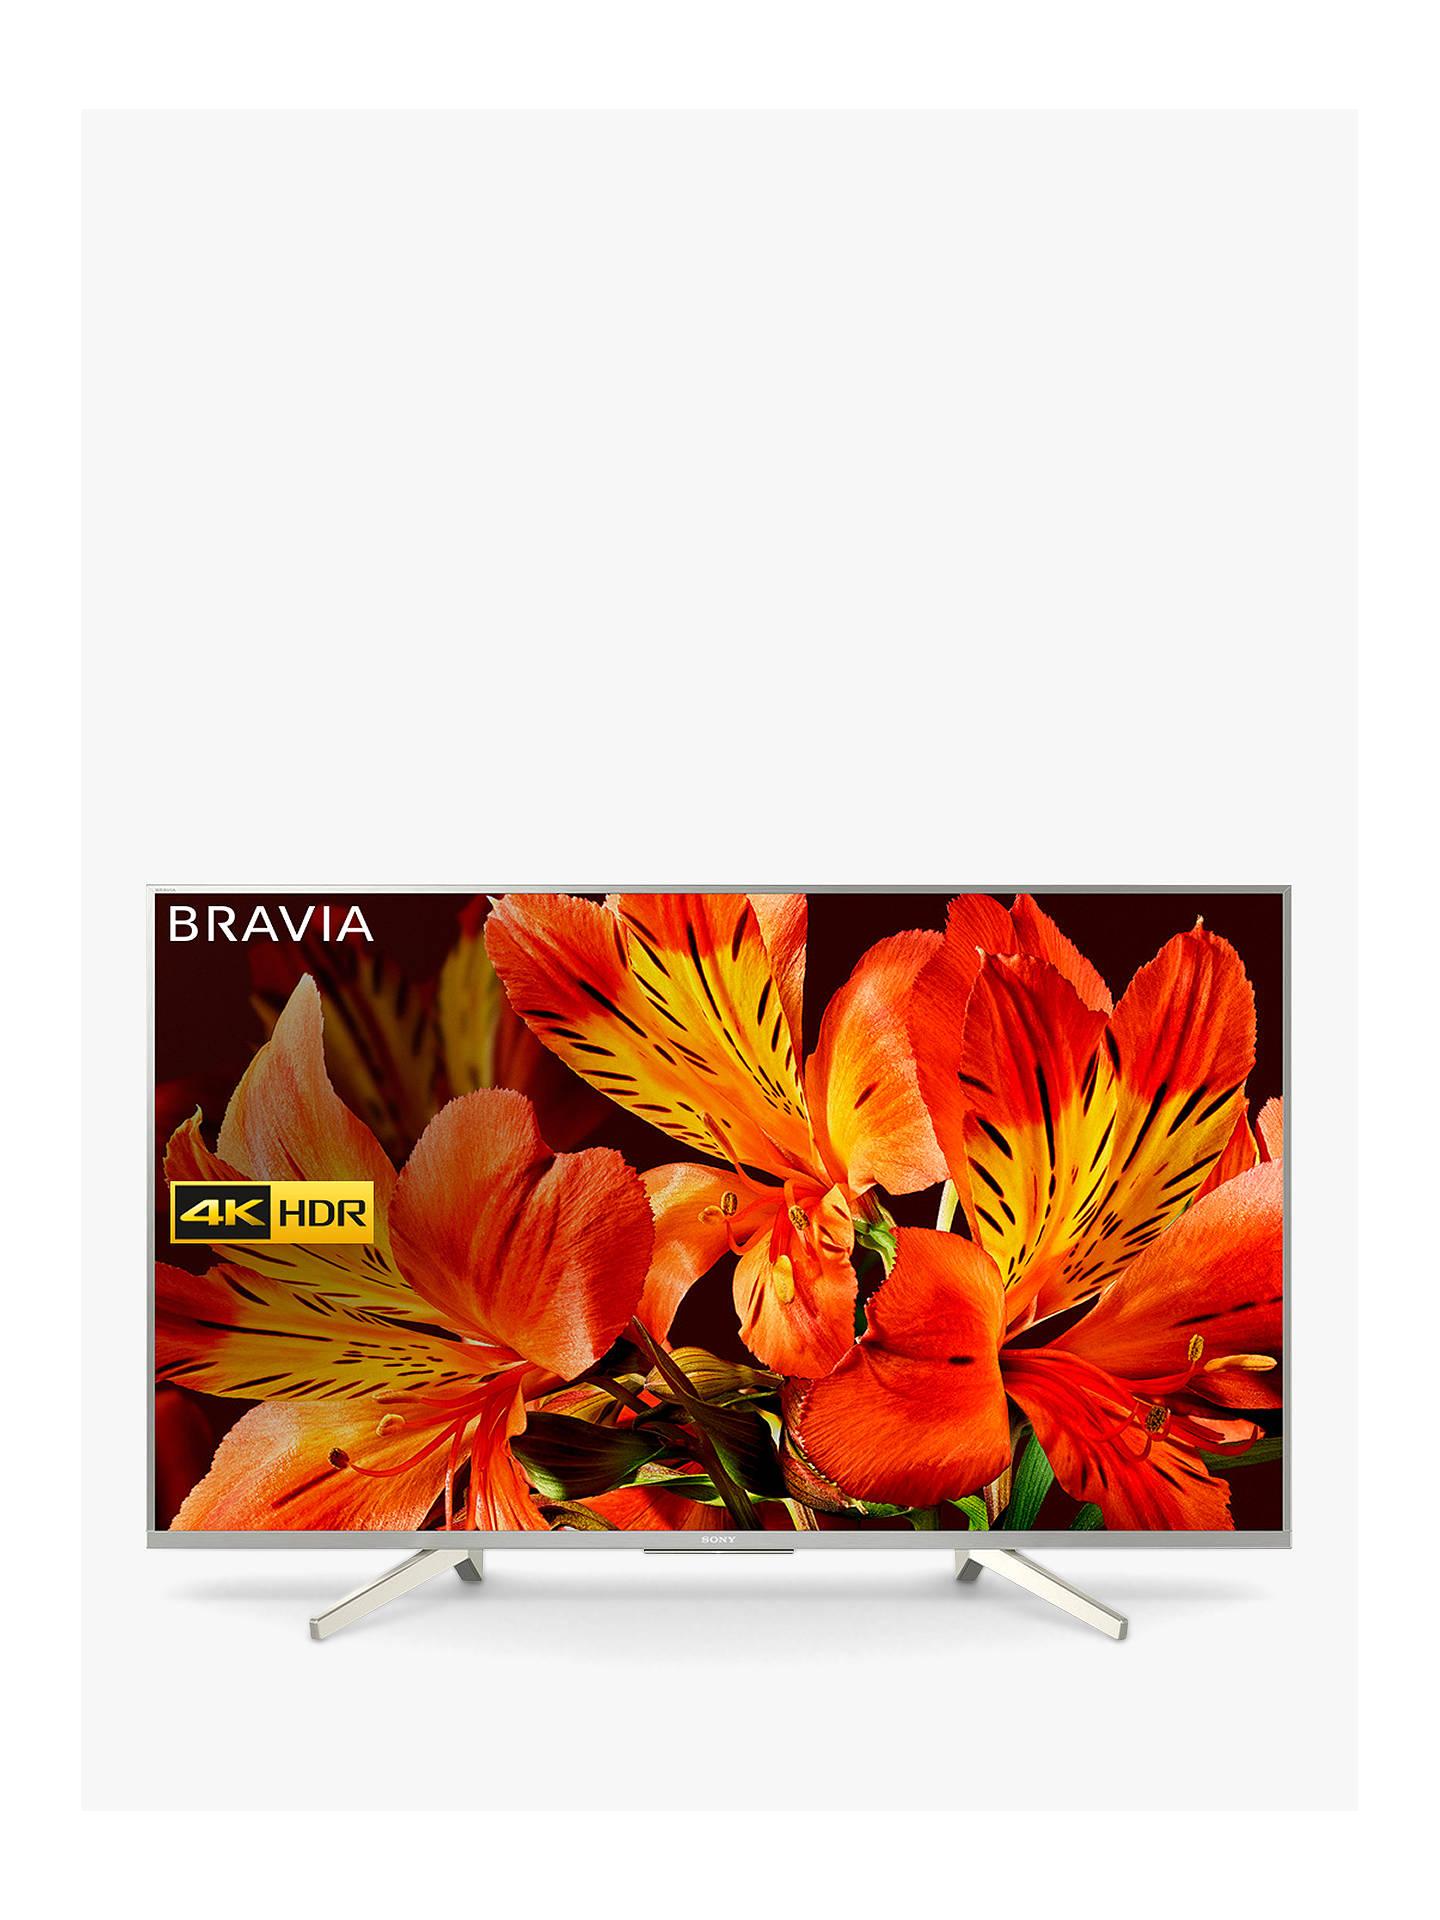 85956e21f0205a BuySony Bravia KD55XF8577 LED HDR 4K Ultra HD Smart Android TV, 55